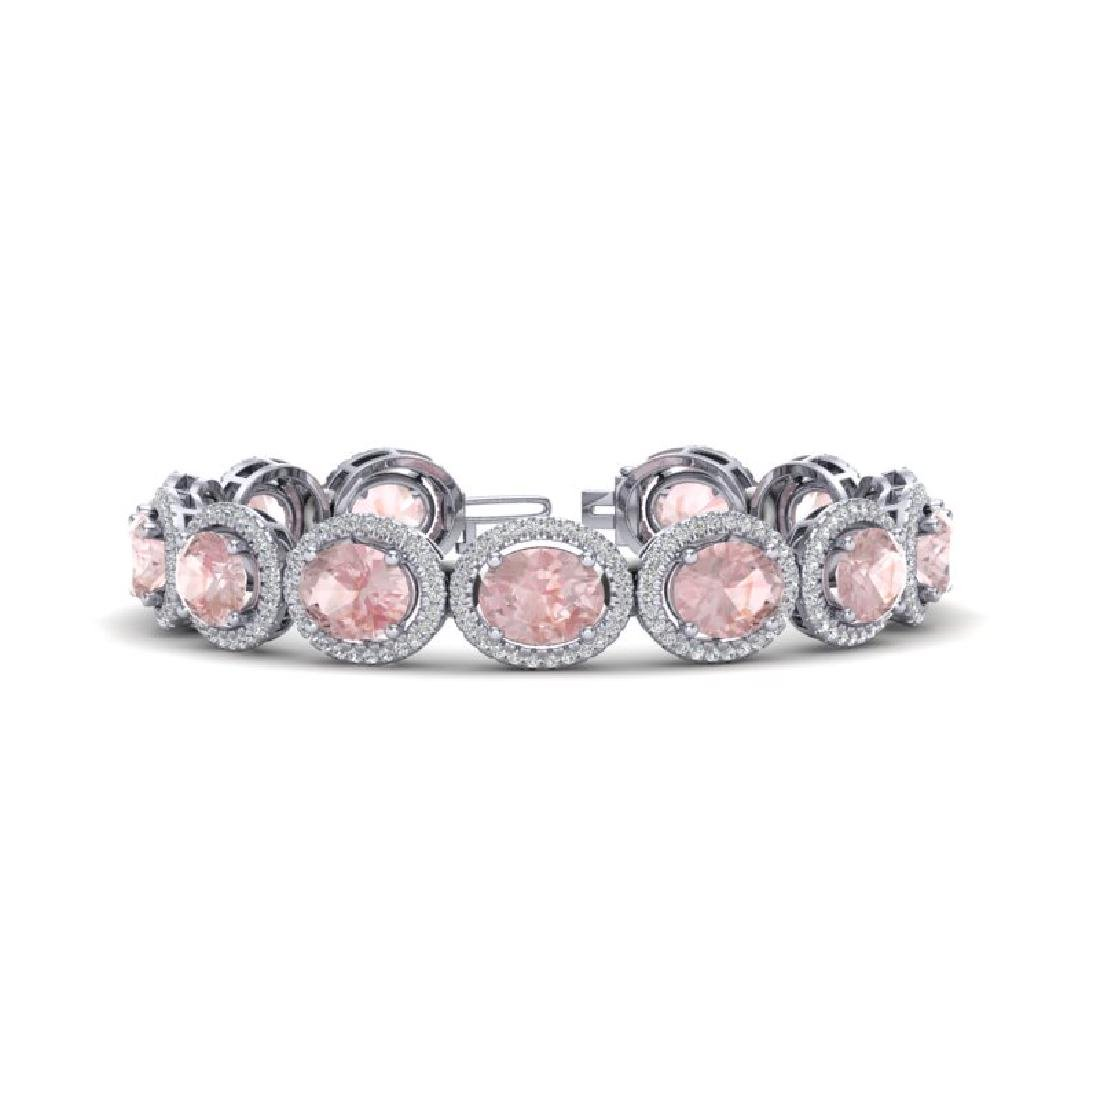 23 CTW Morganite & Micro Pave VS/SI Diamond Bracelet